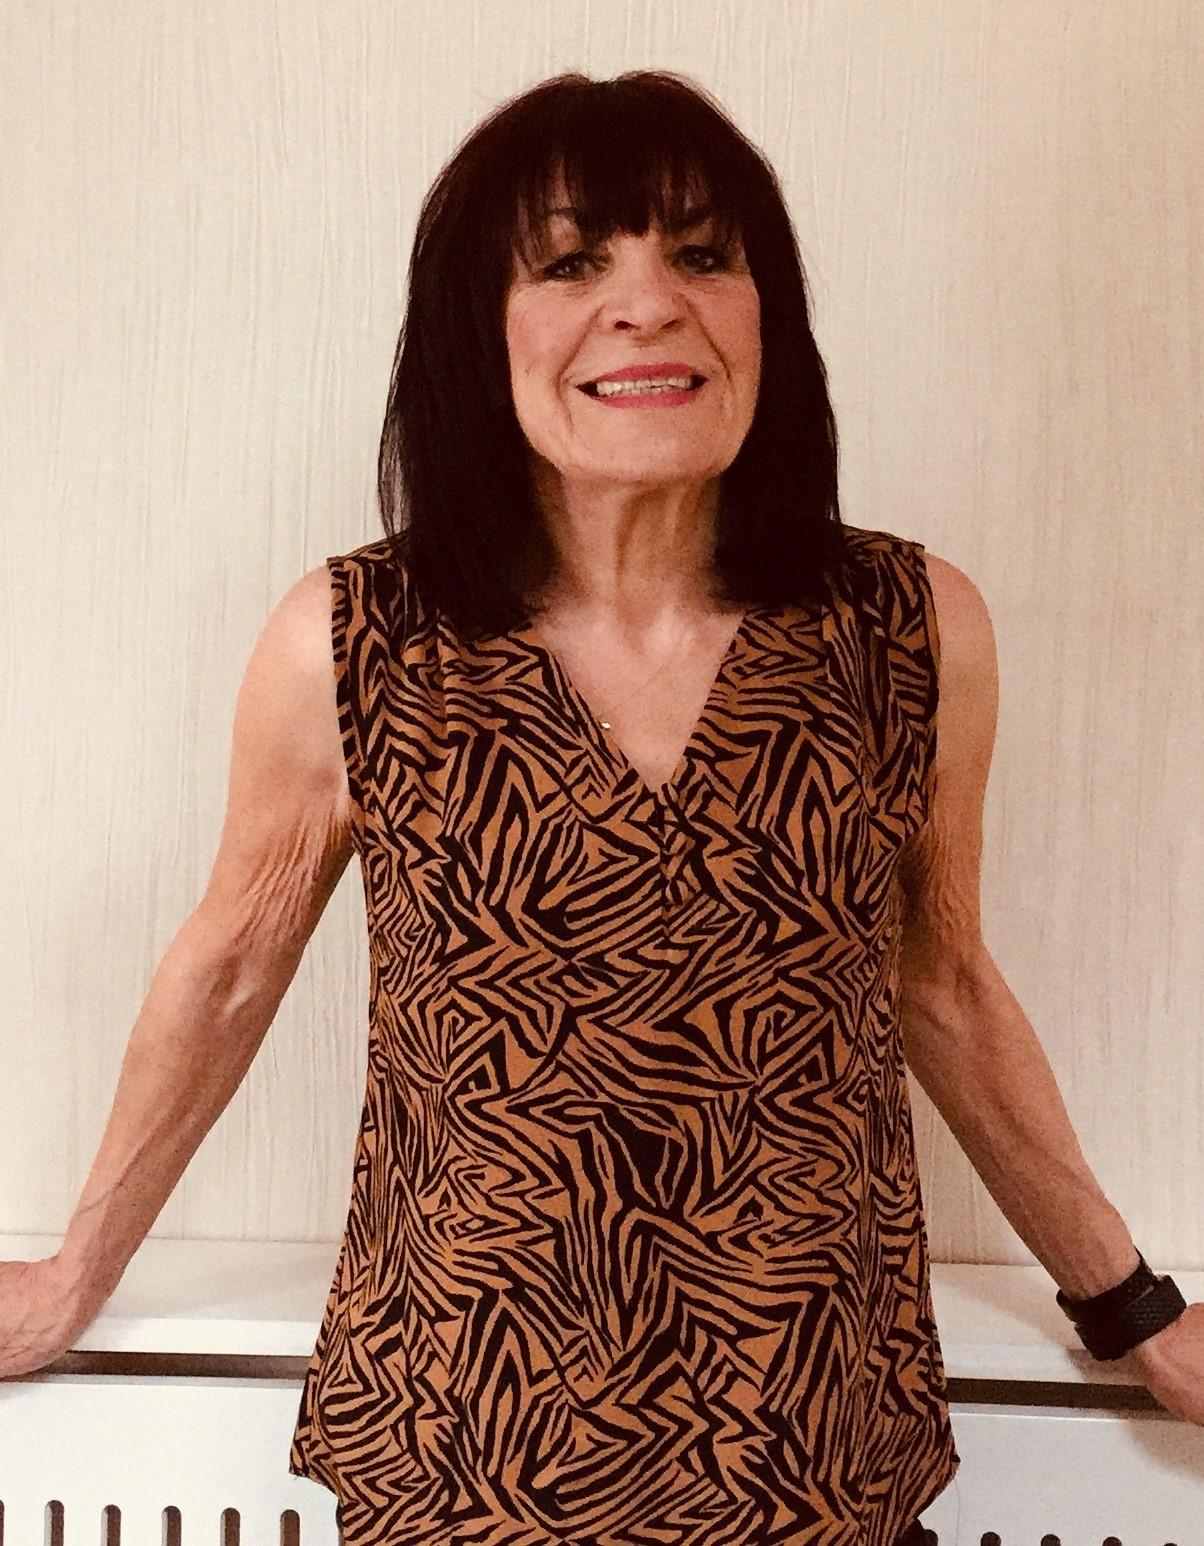 Diana Hattersley